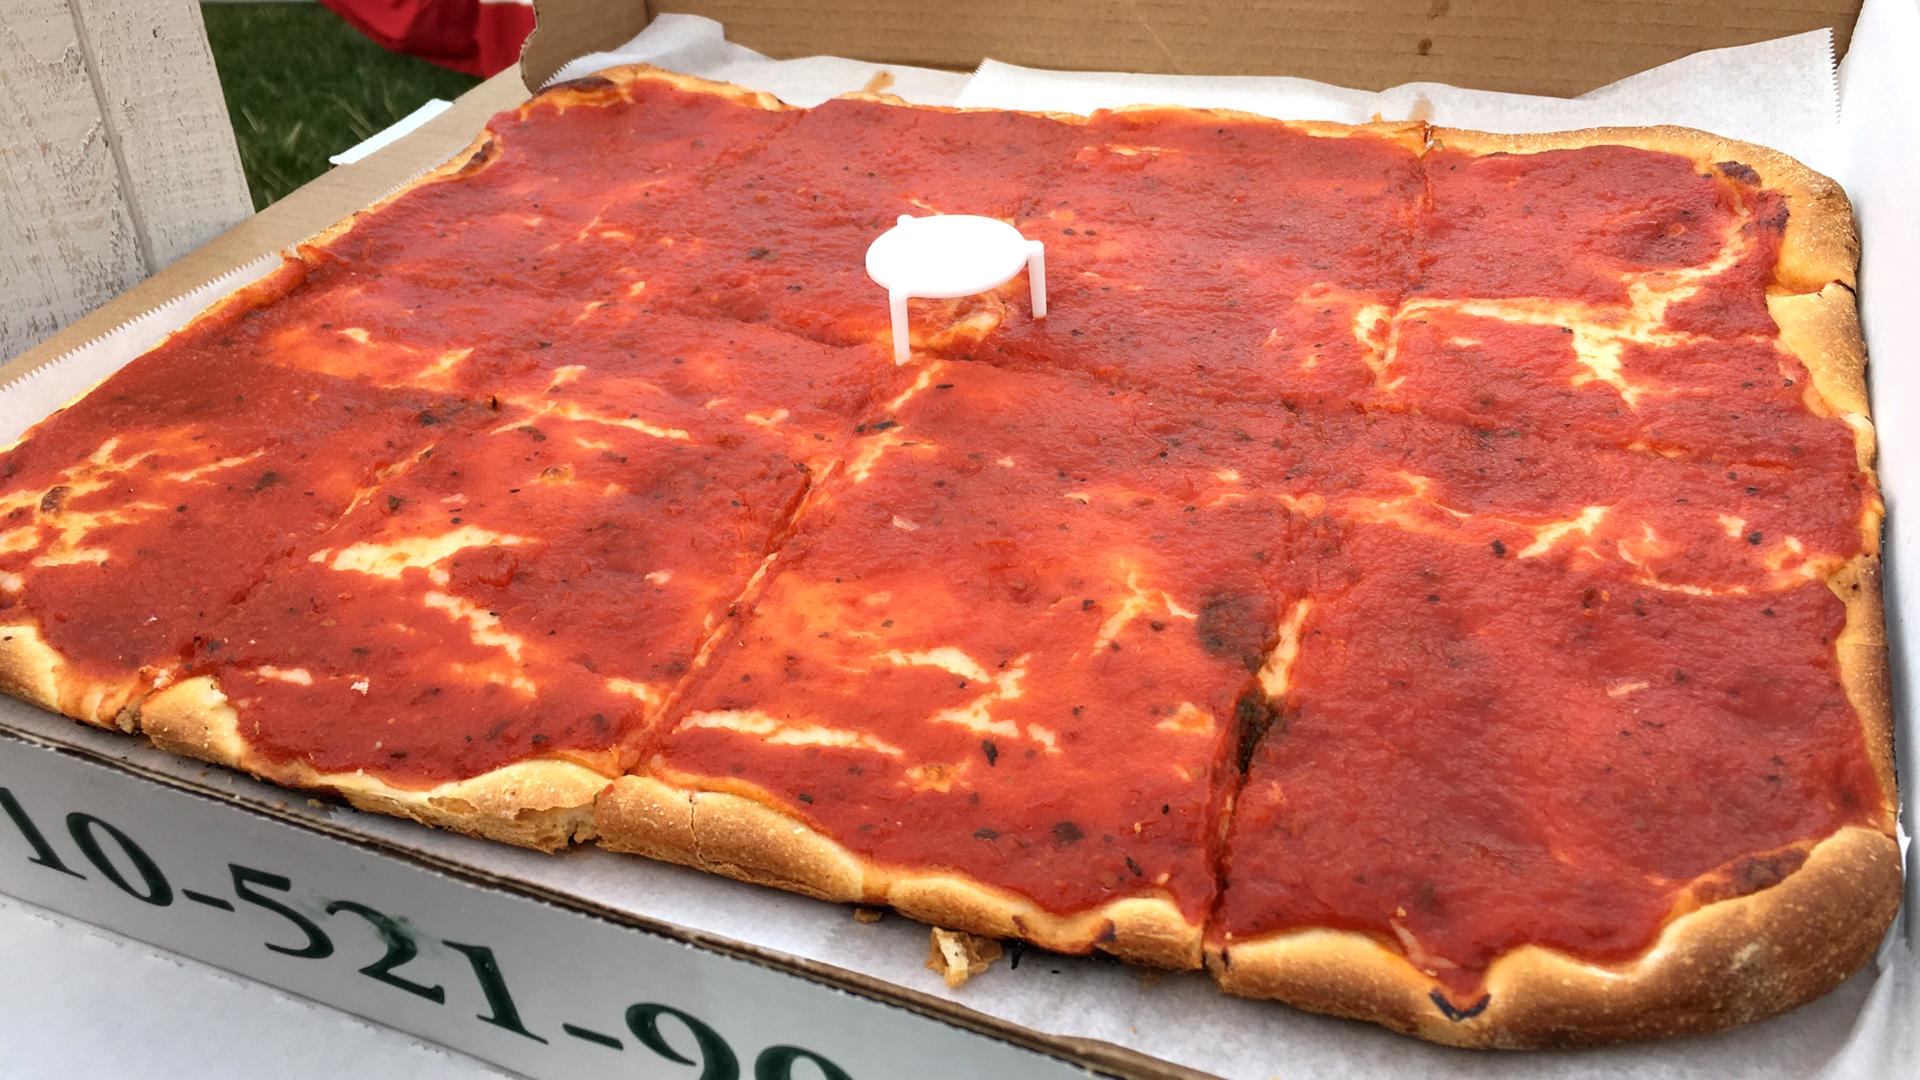 Iconic Philadelphia Foods Tomato Pie Roast Pork Sandwiches